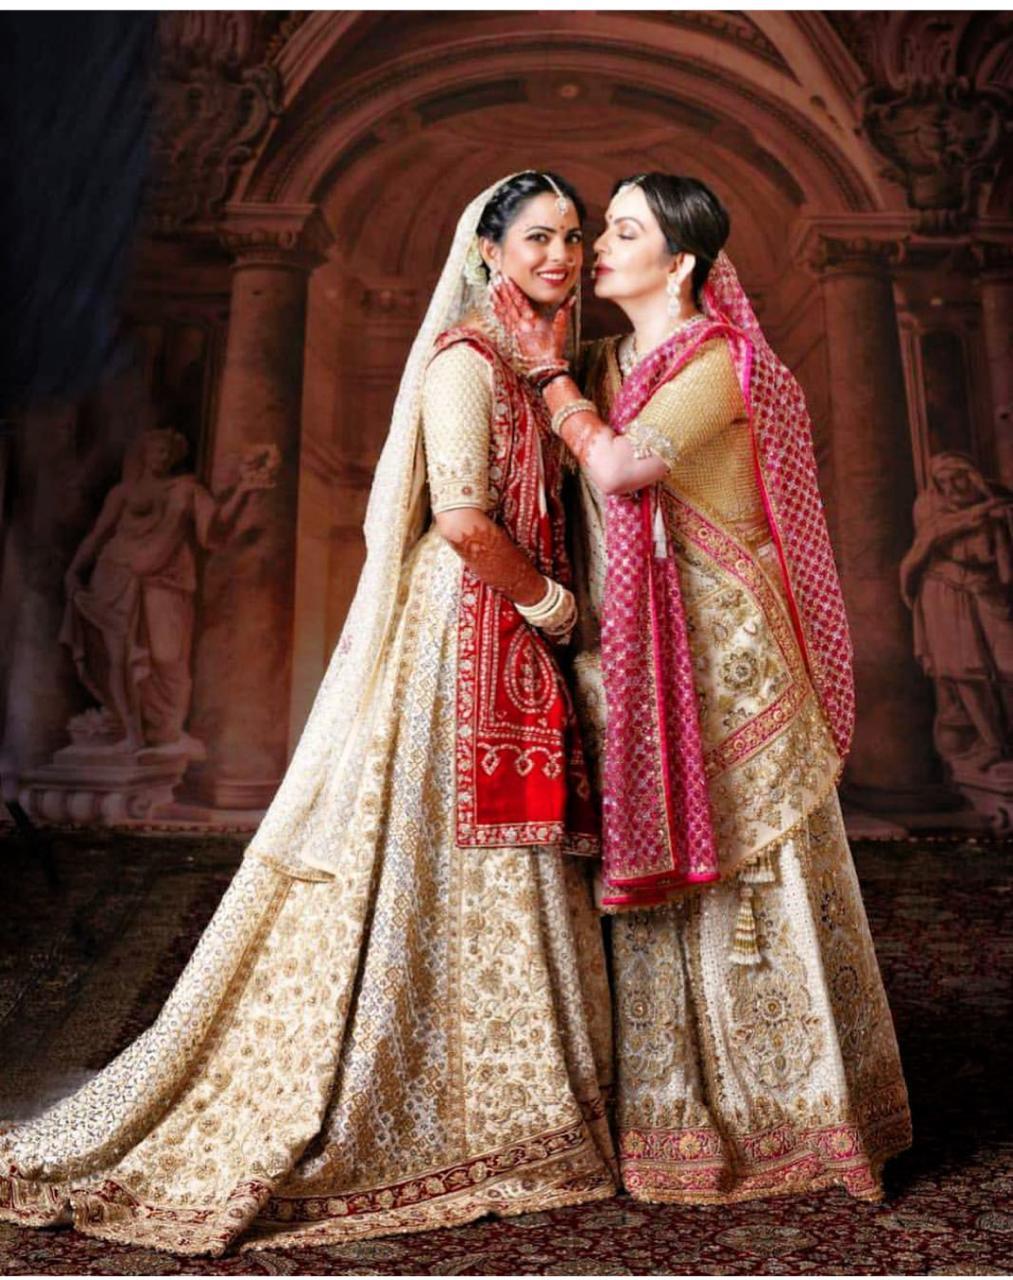 Isha Ambani Priyanka Chopra And Deepika Padukone 3 Brides